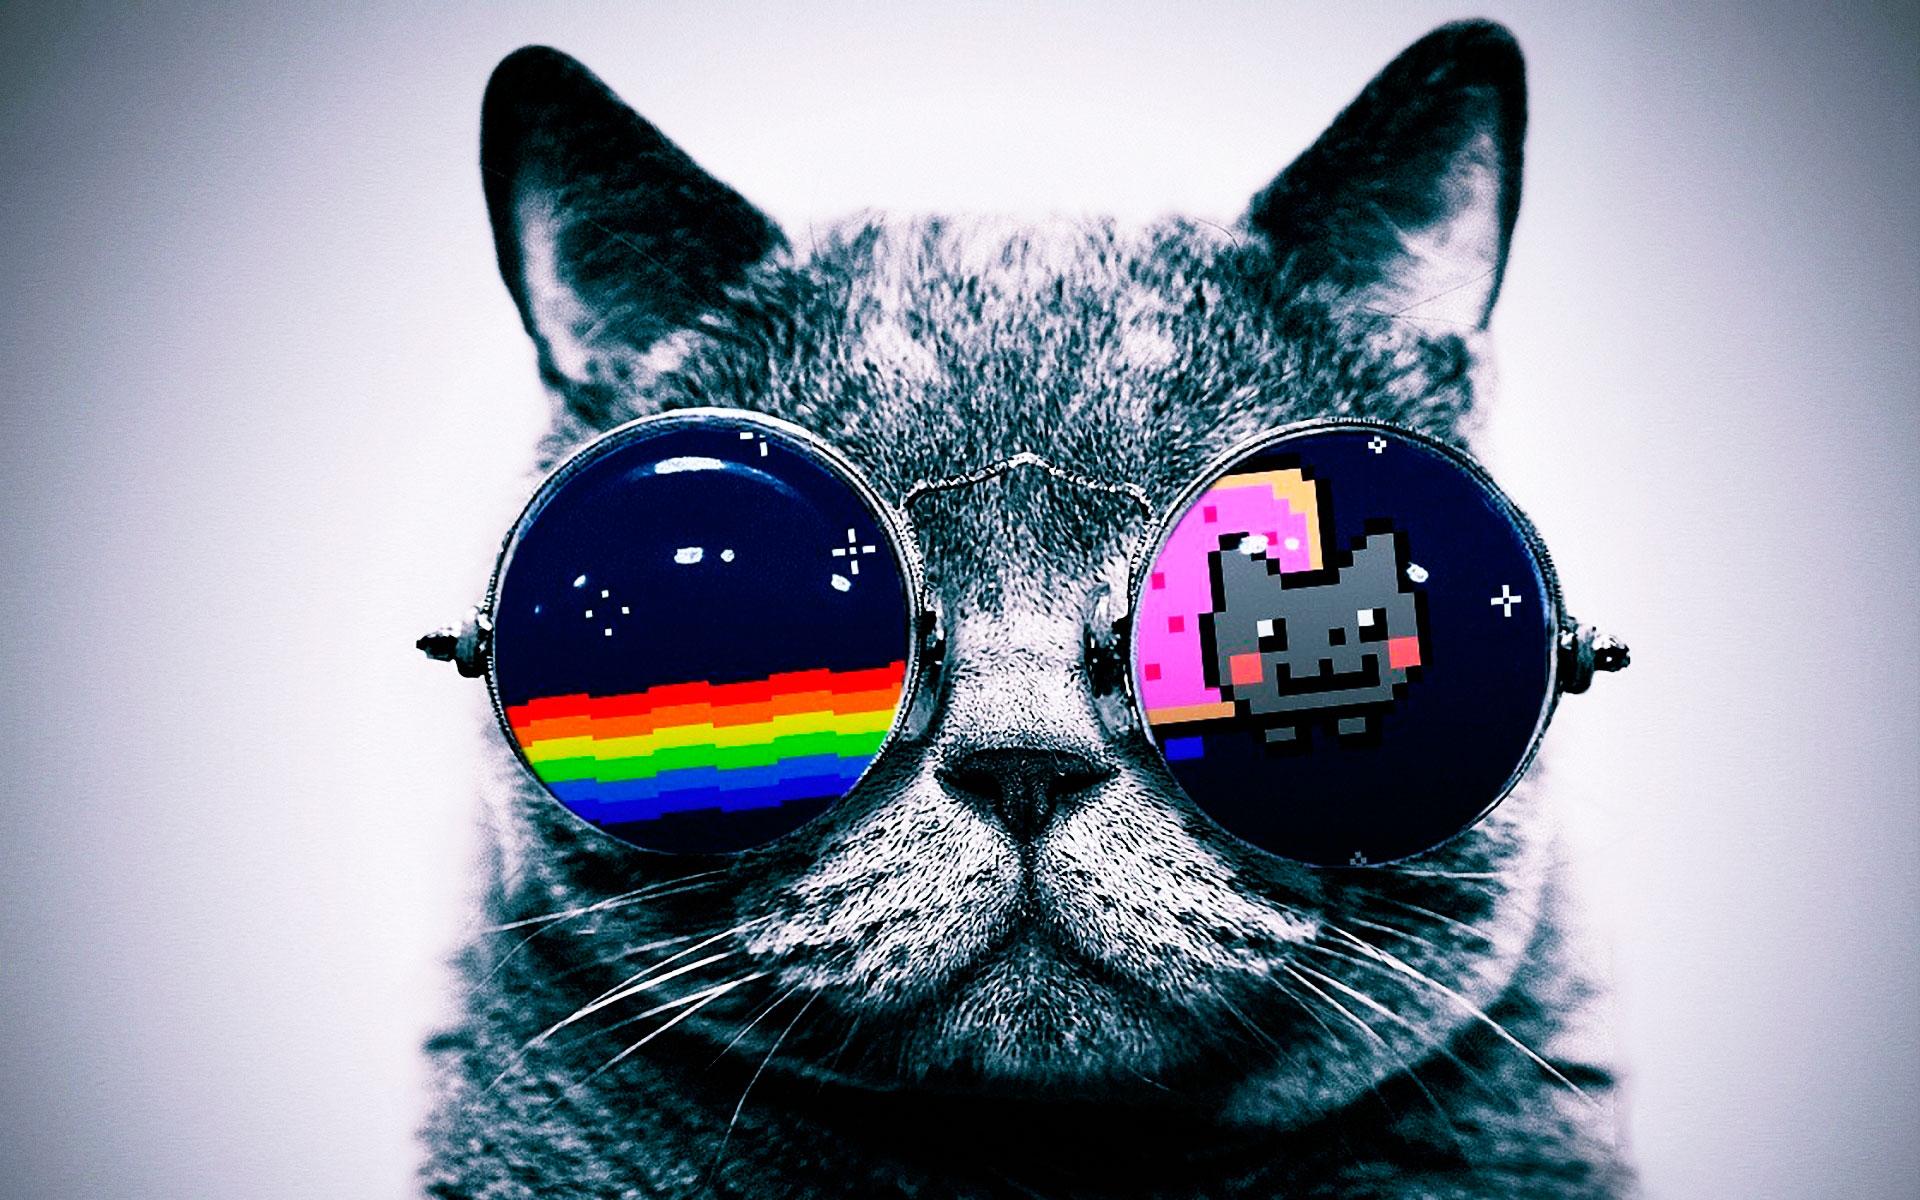 rainbow cat wallpapers - photo #32